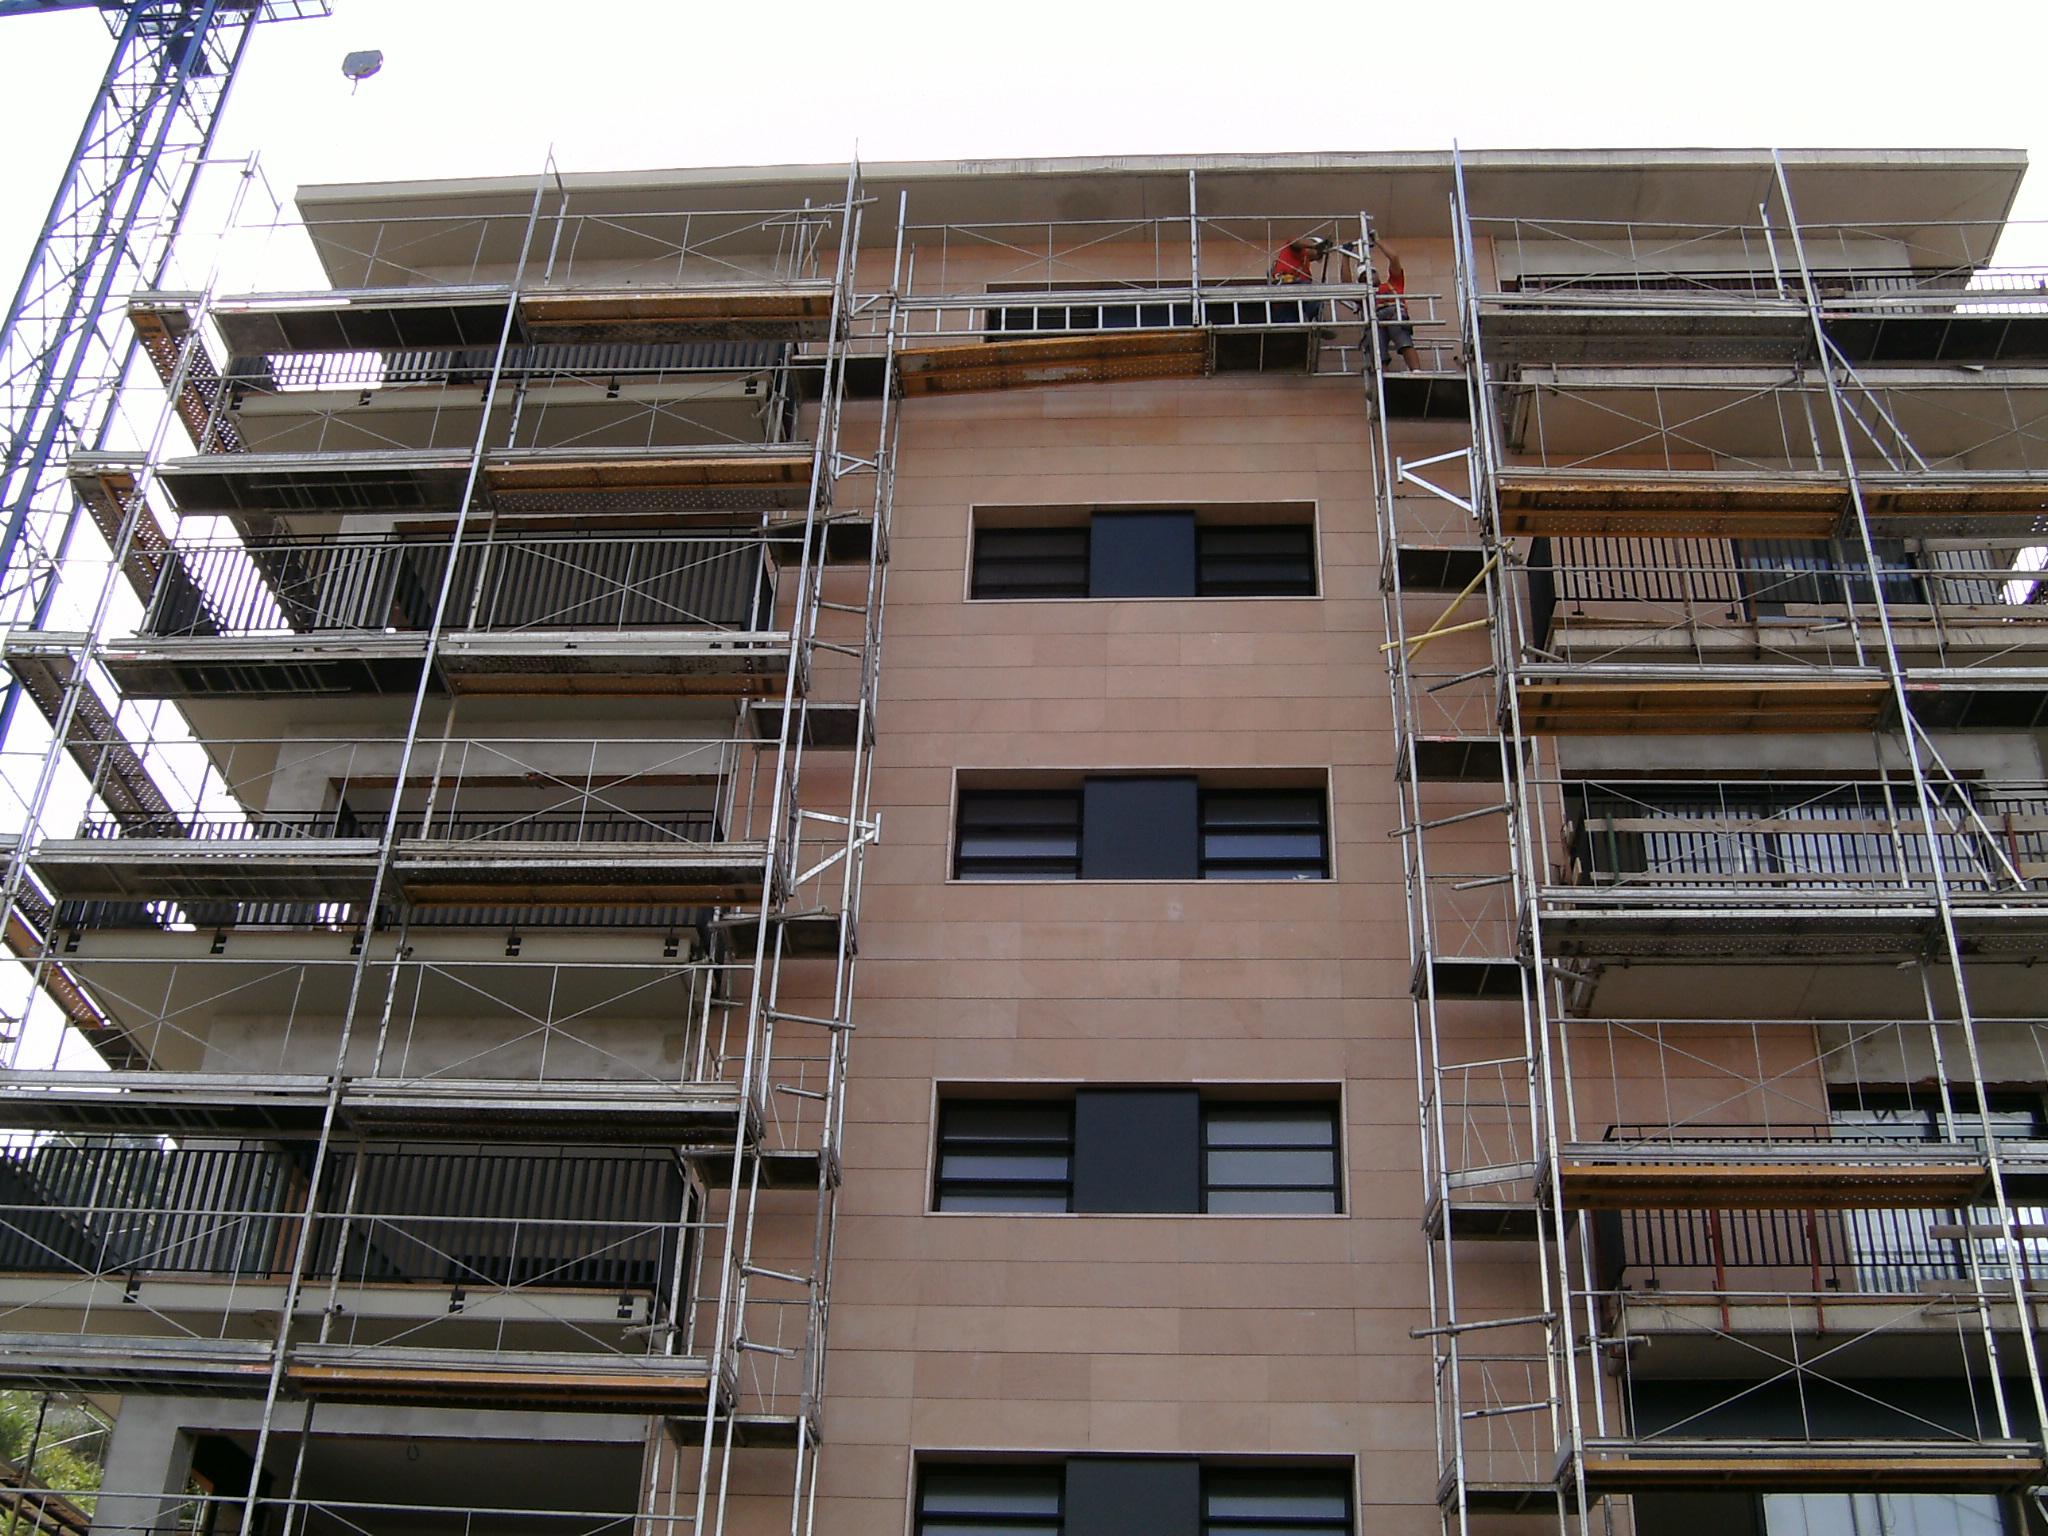 c/ Mur, Martorell, Barcelona